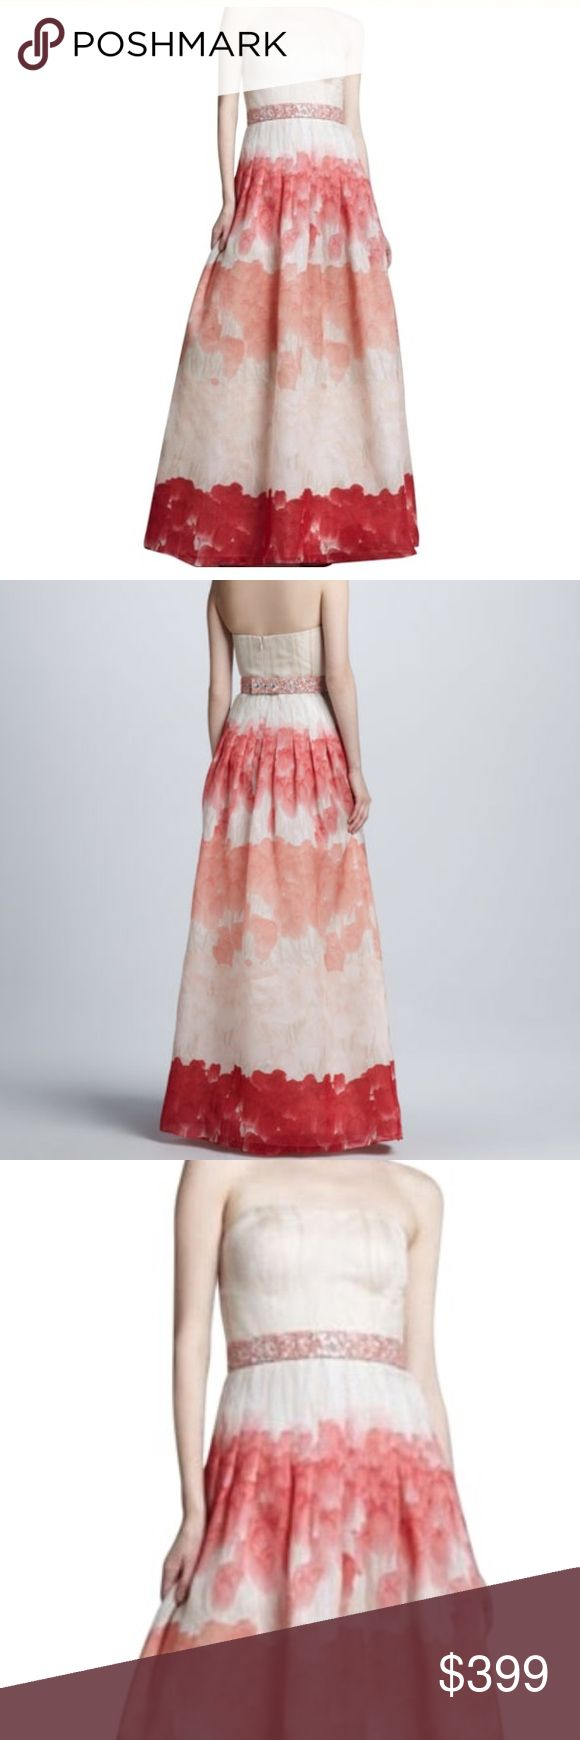 Kay unger maxi dress